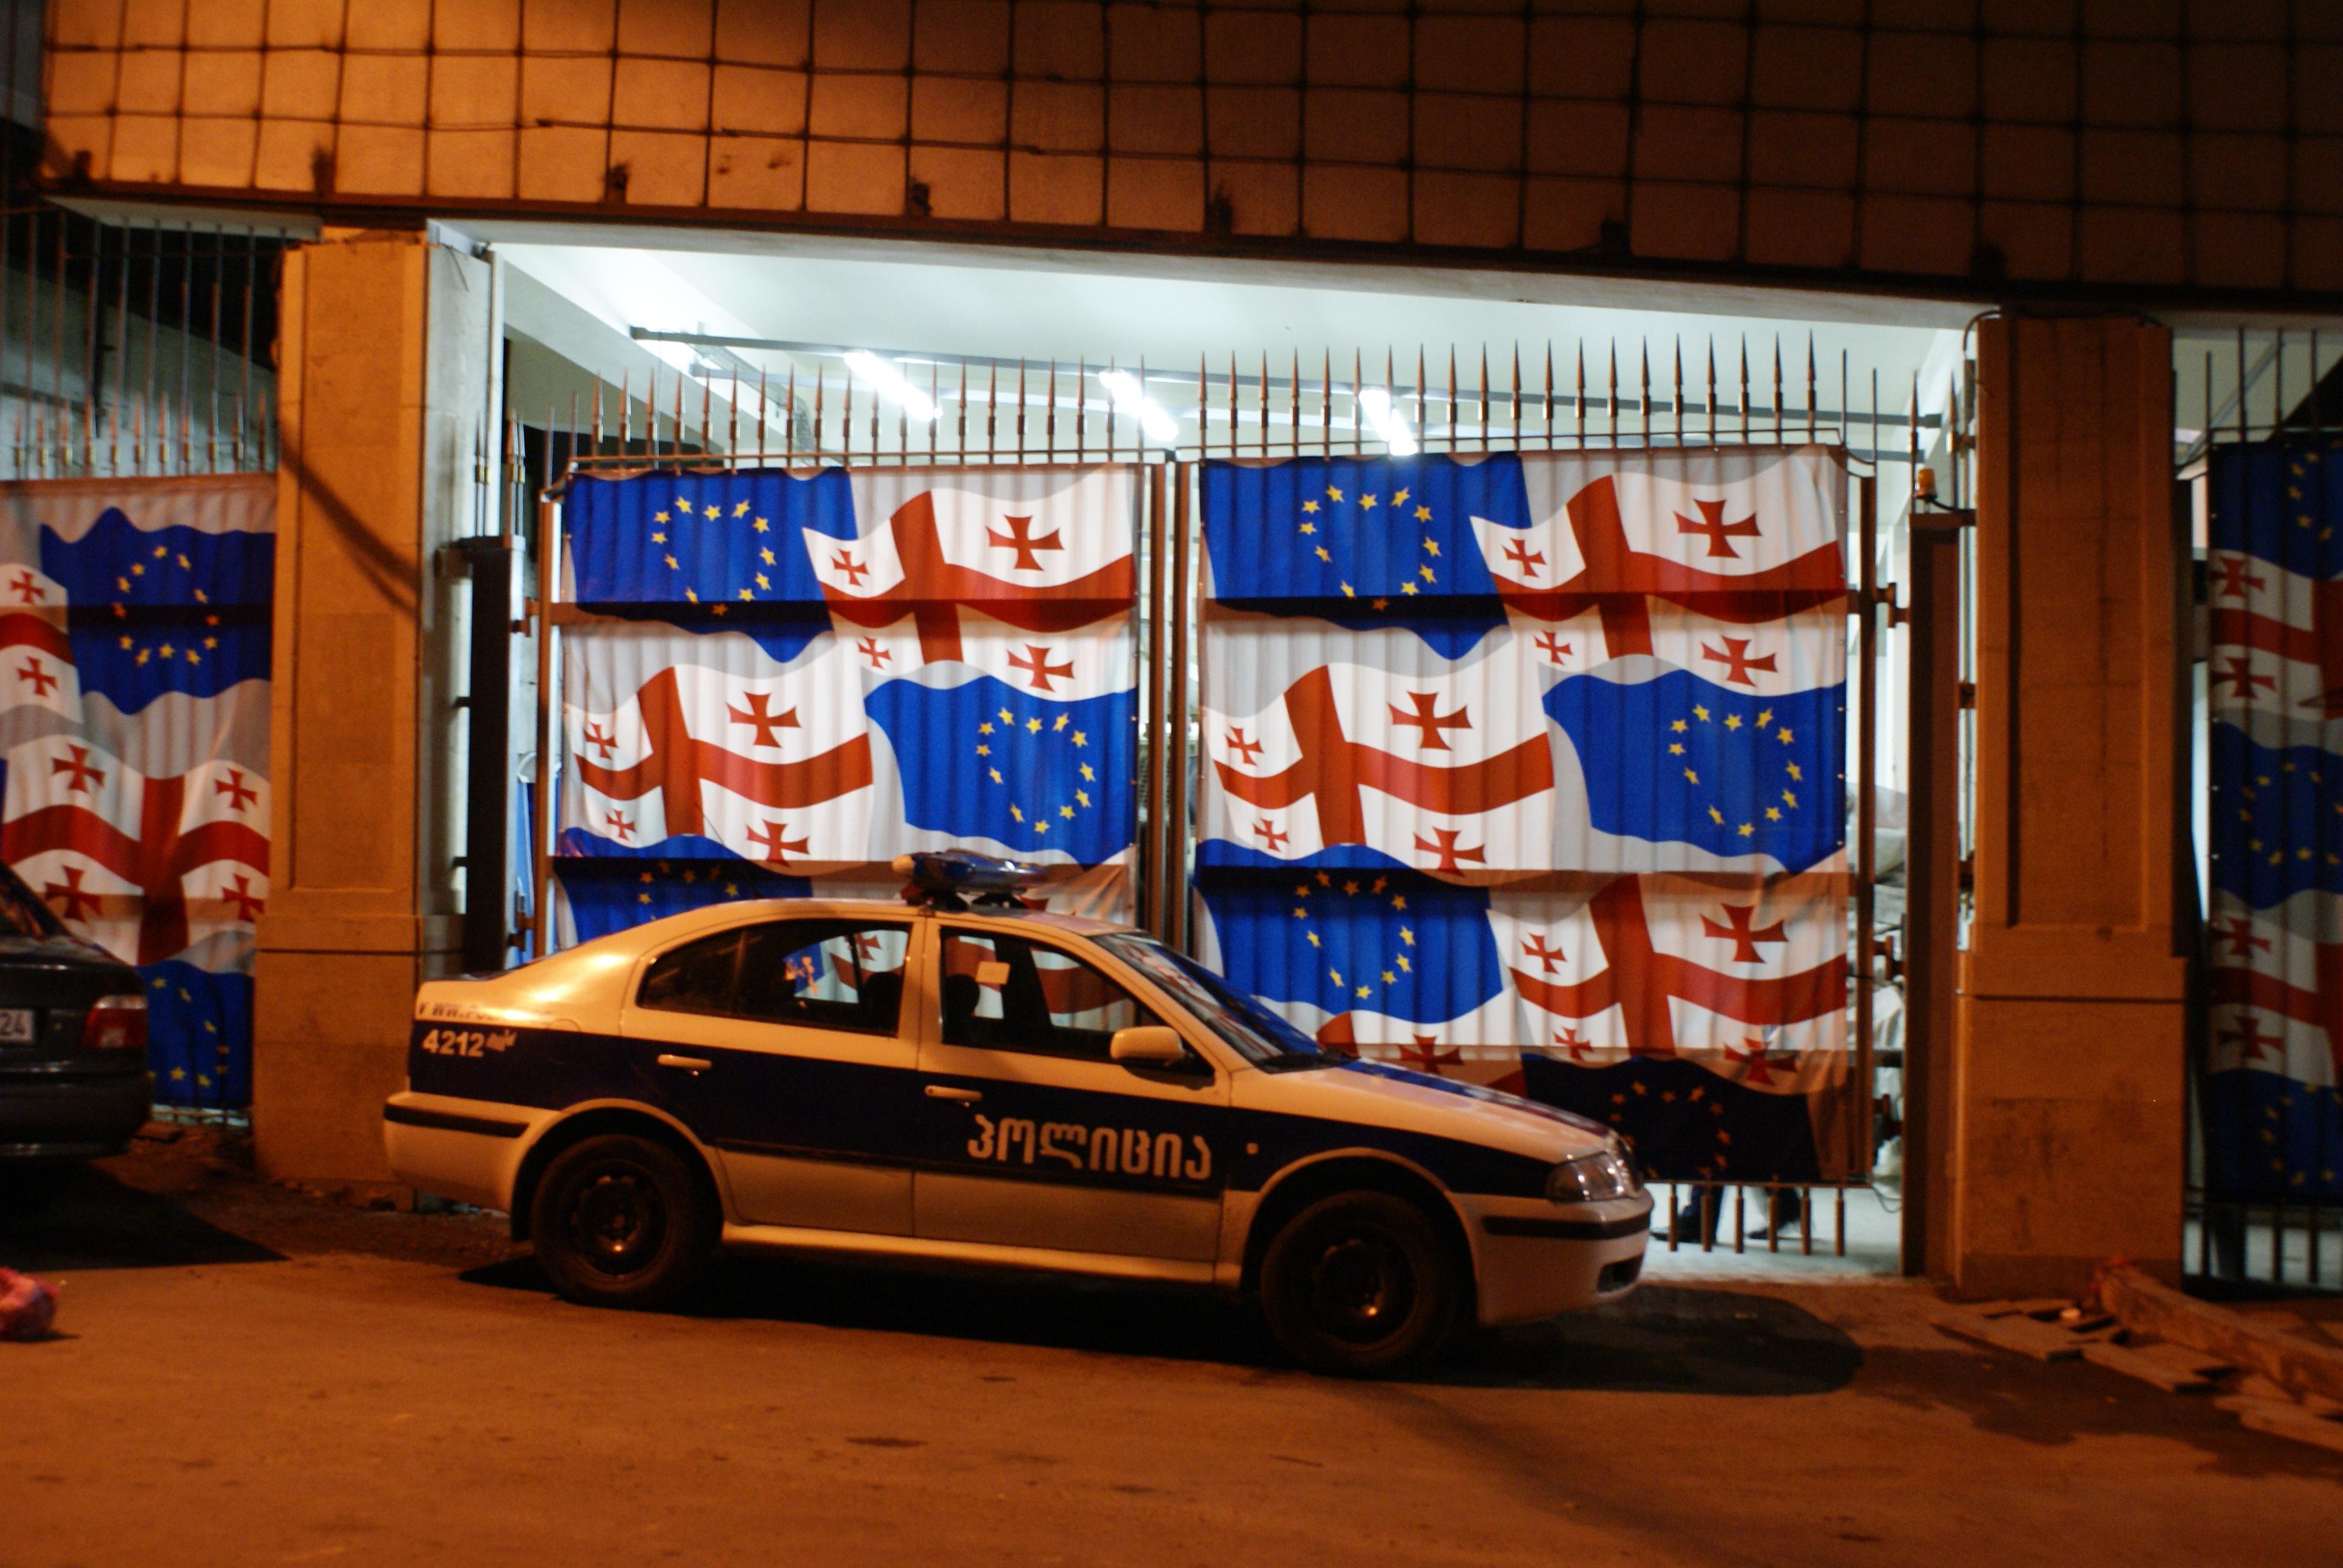 How To Buy A Car In Tbilisi Georgia: File:Georgia (Tbilisi) Police Car.JPG